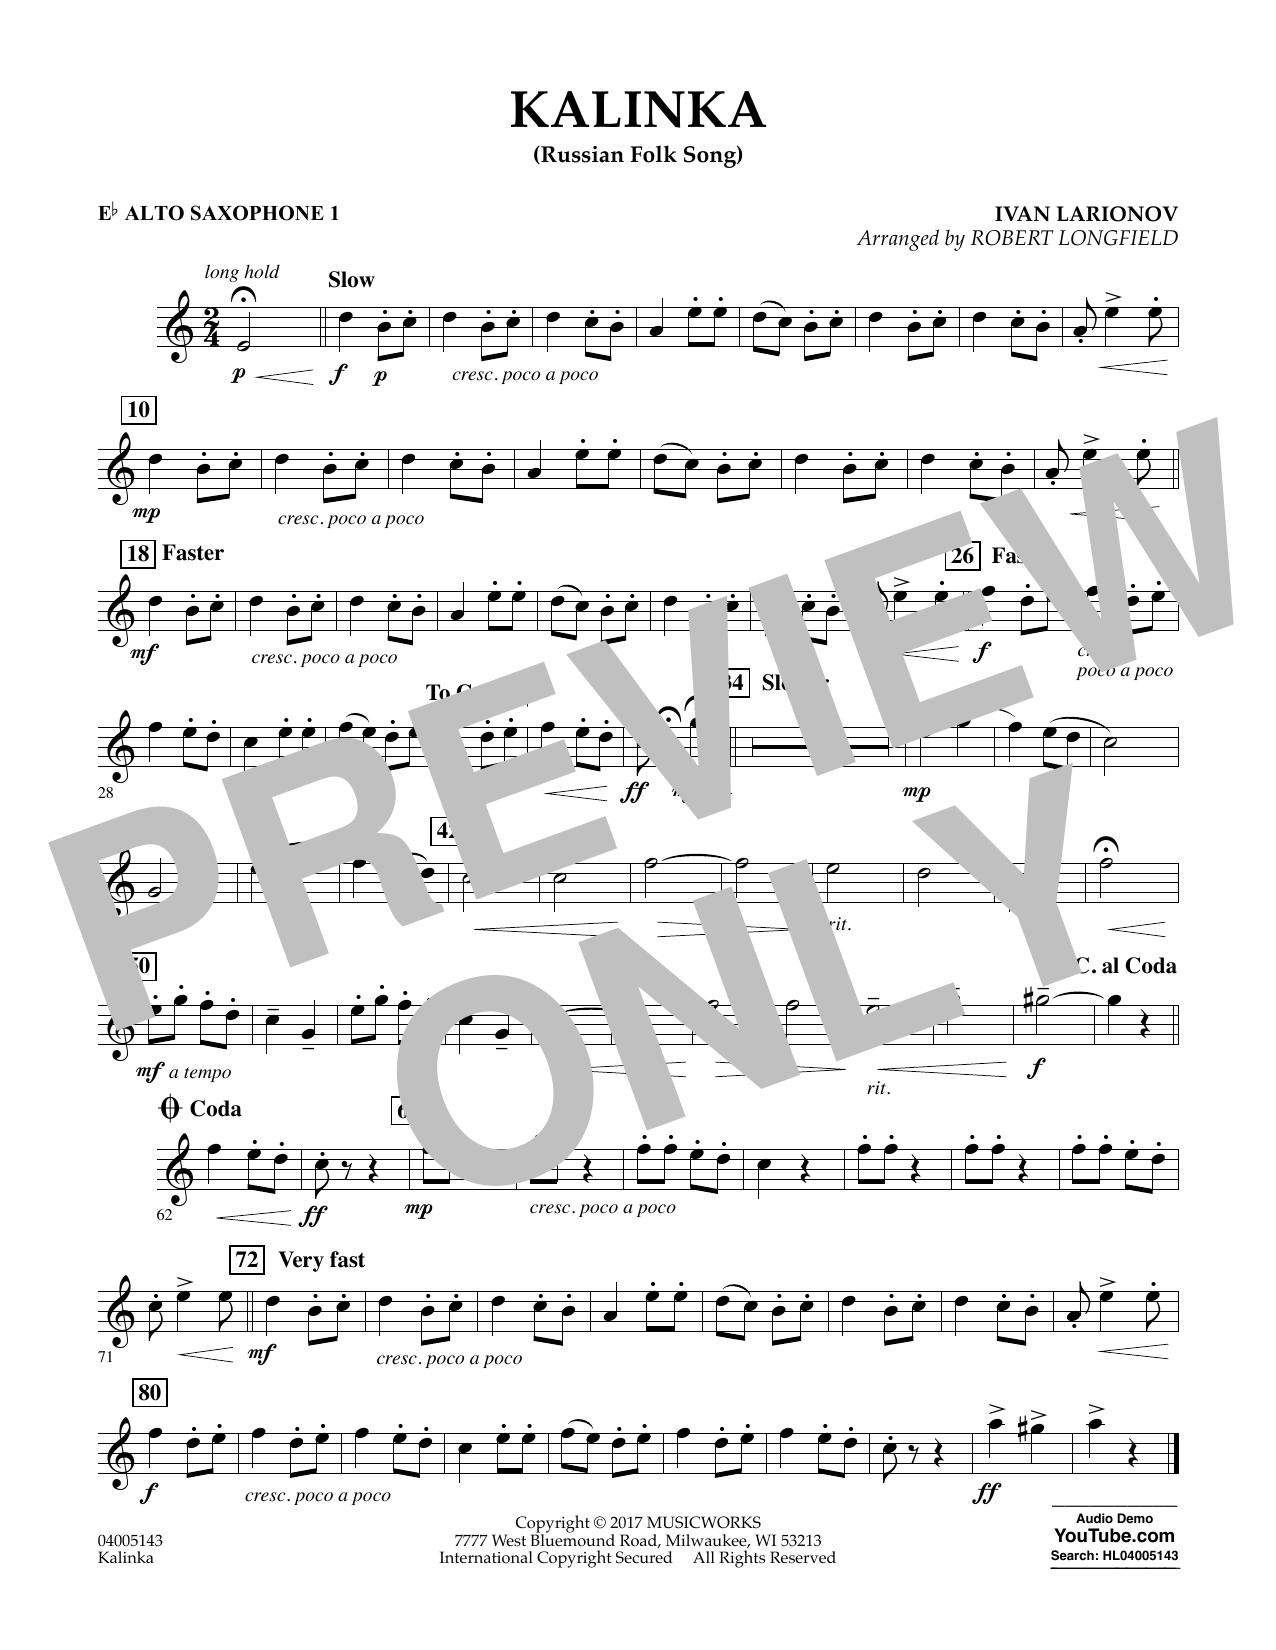 Robert Longfield Kalinka (Russian Folk Song) - Eb Alto Saxophone 1 sheet music notes and chords. Download Printable PDF.